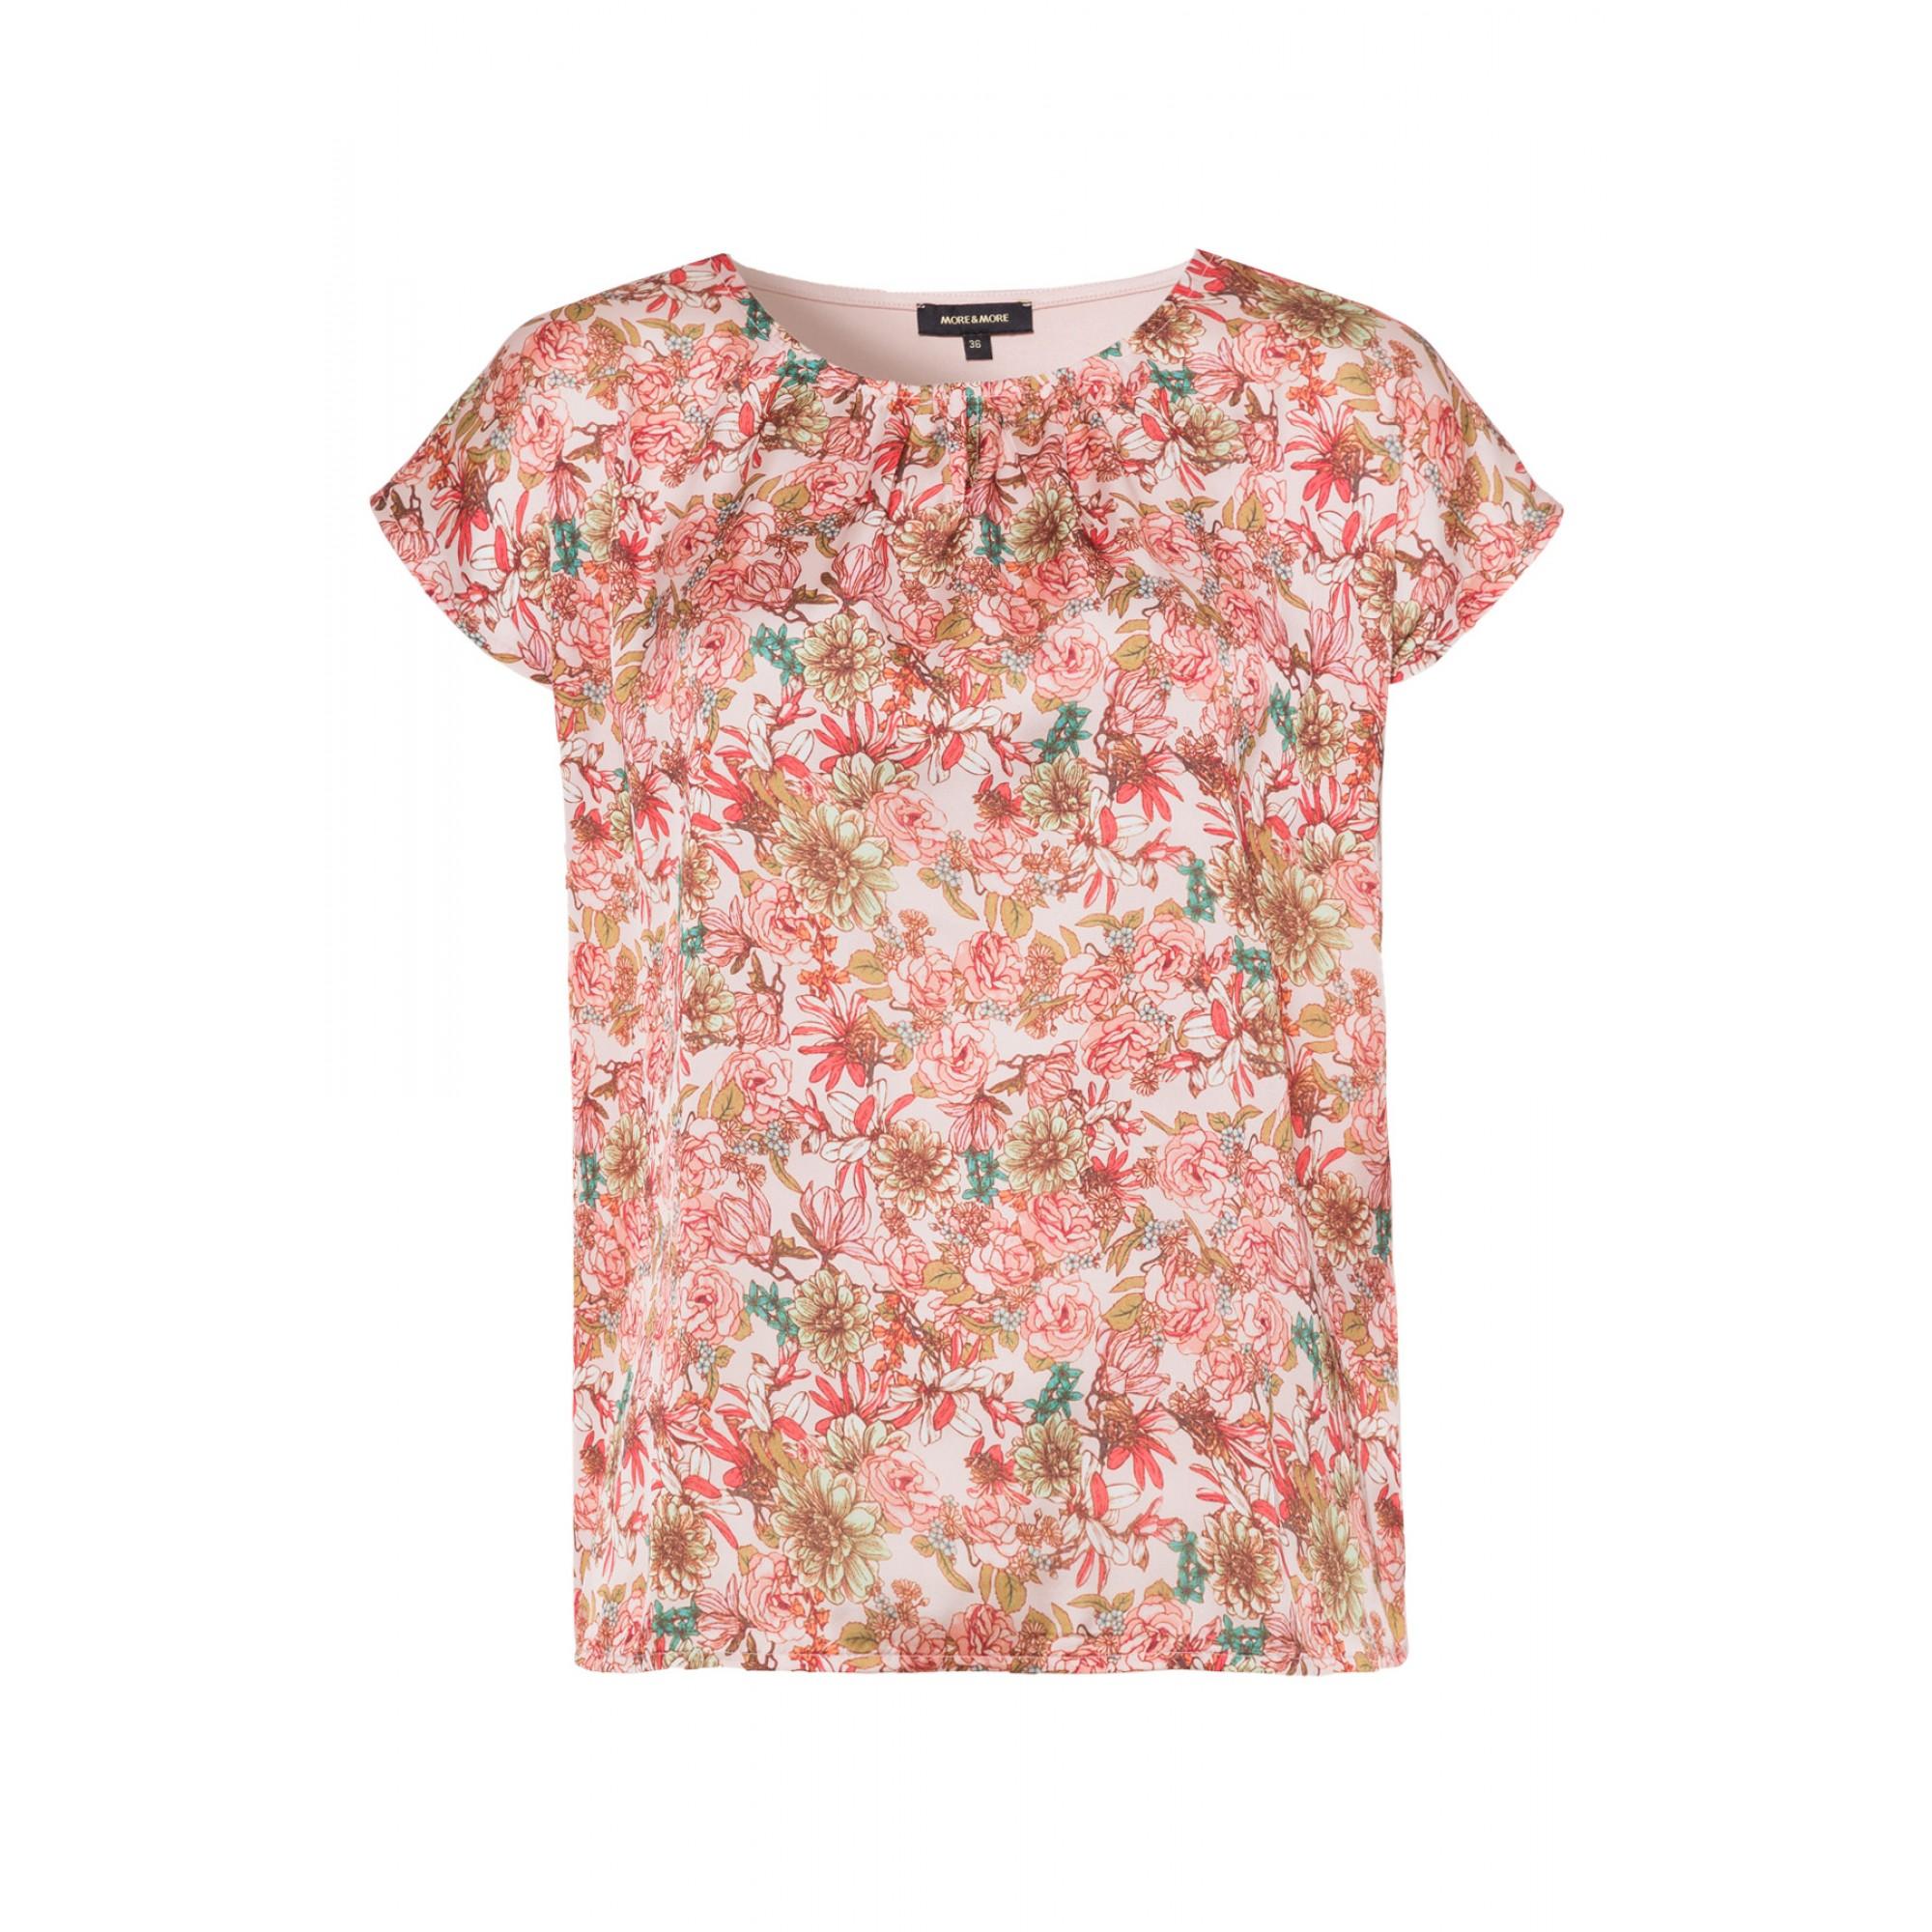 More & More kurzarm Shirt mit floralem Muster orange